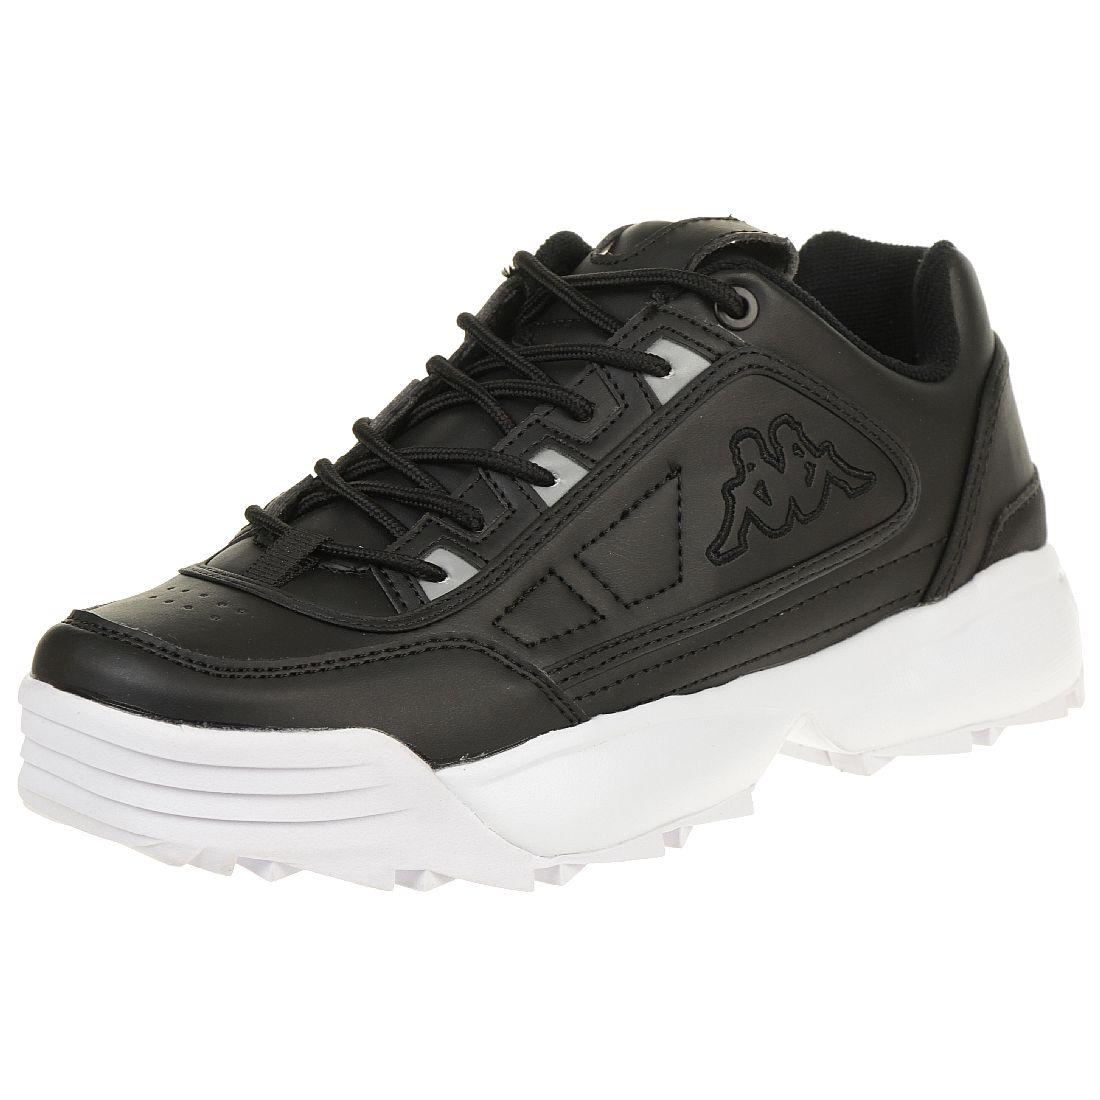 half off c85b2 da331 Kappa RAVE Sneaker Damen Turnschuhe Schuhe schwarz Sneaker ...